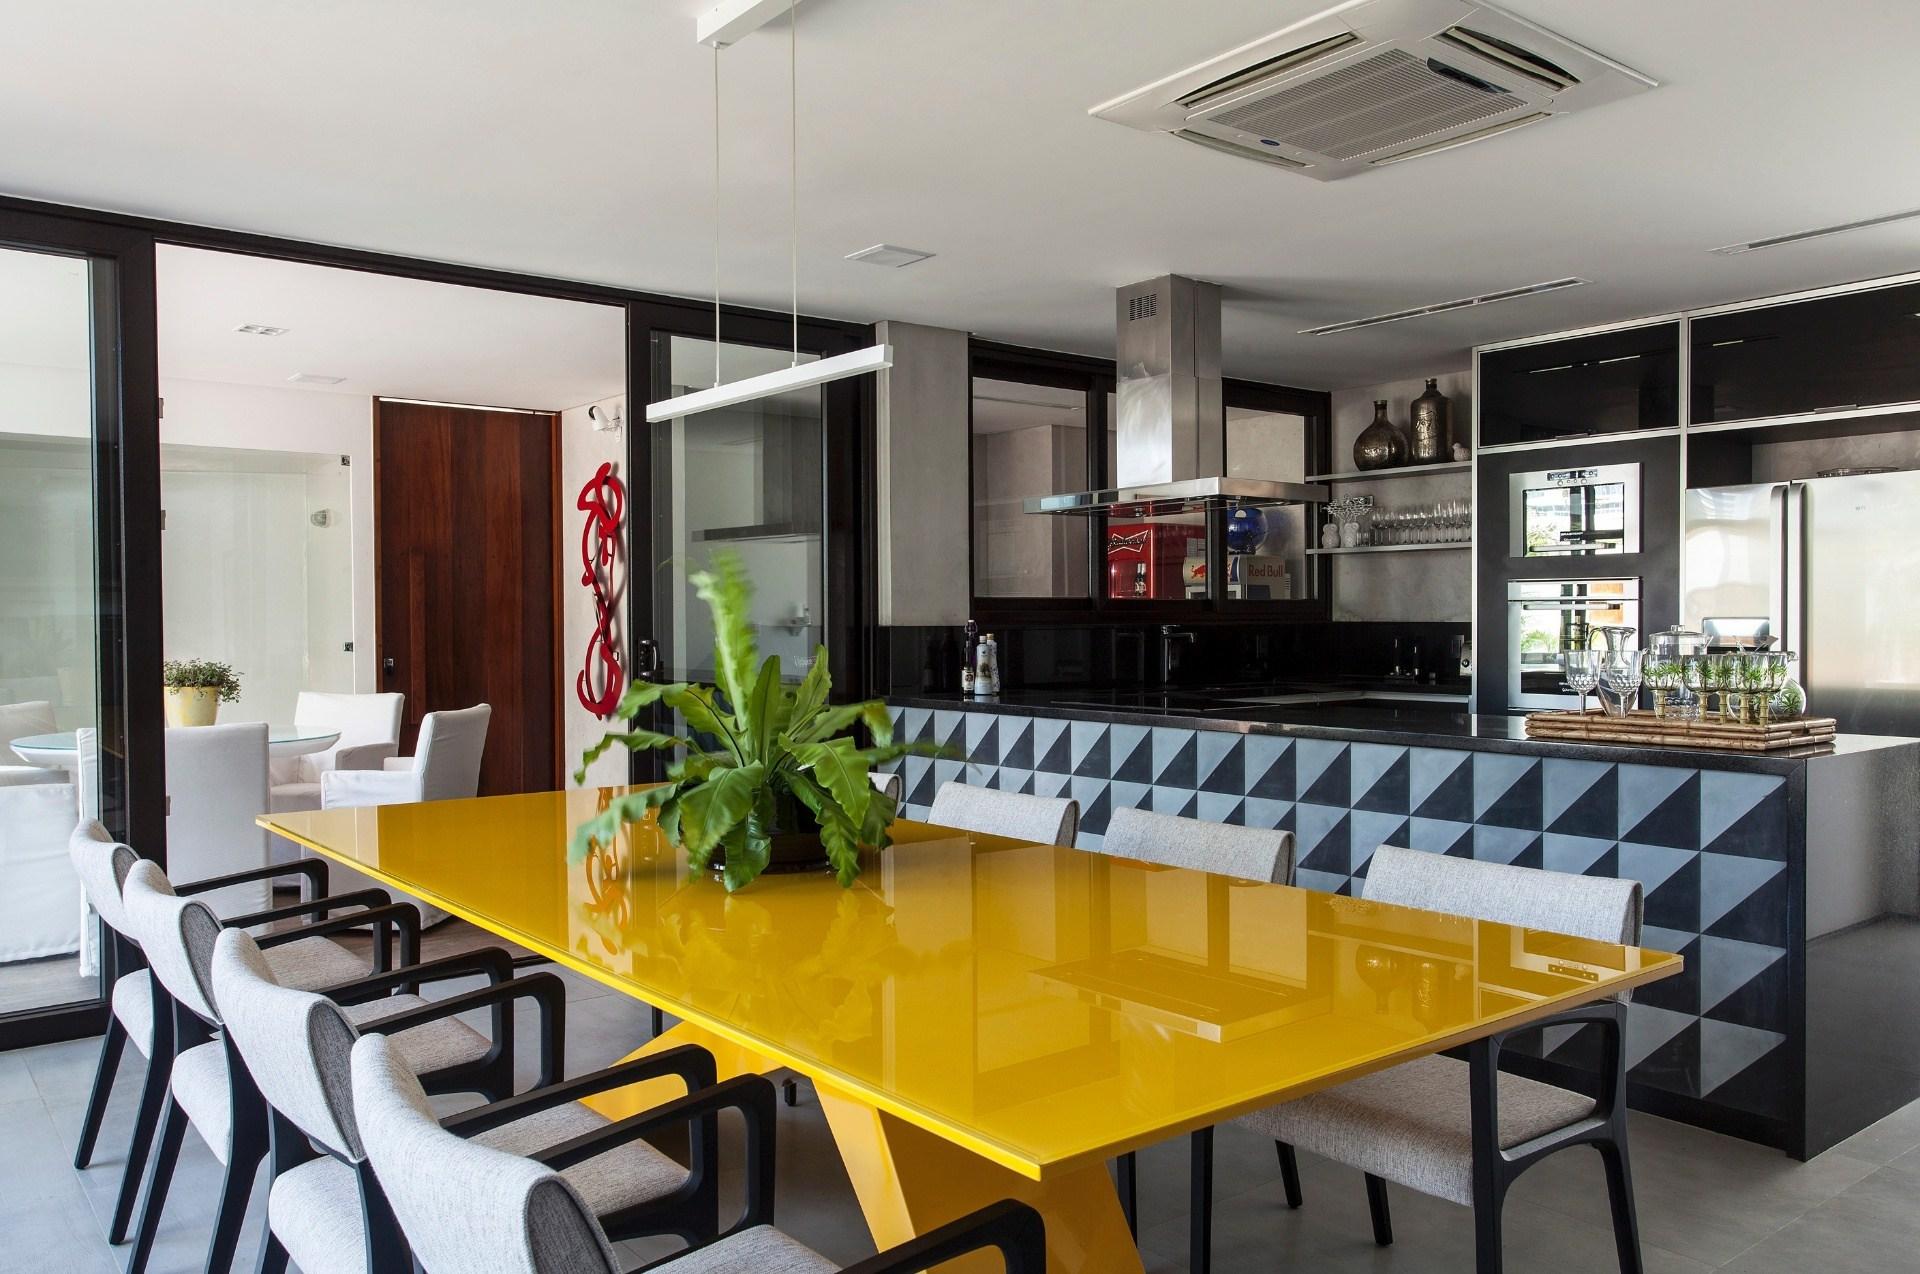 Mesas de comedor modernas 2017 todos los modelos hoy for Mesas redondas para comedor modernas